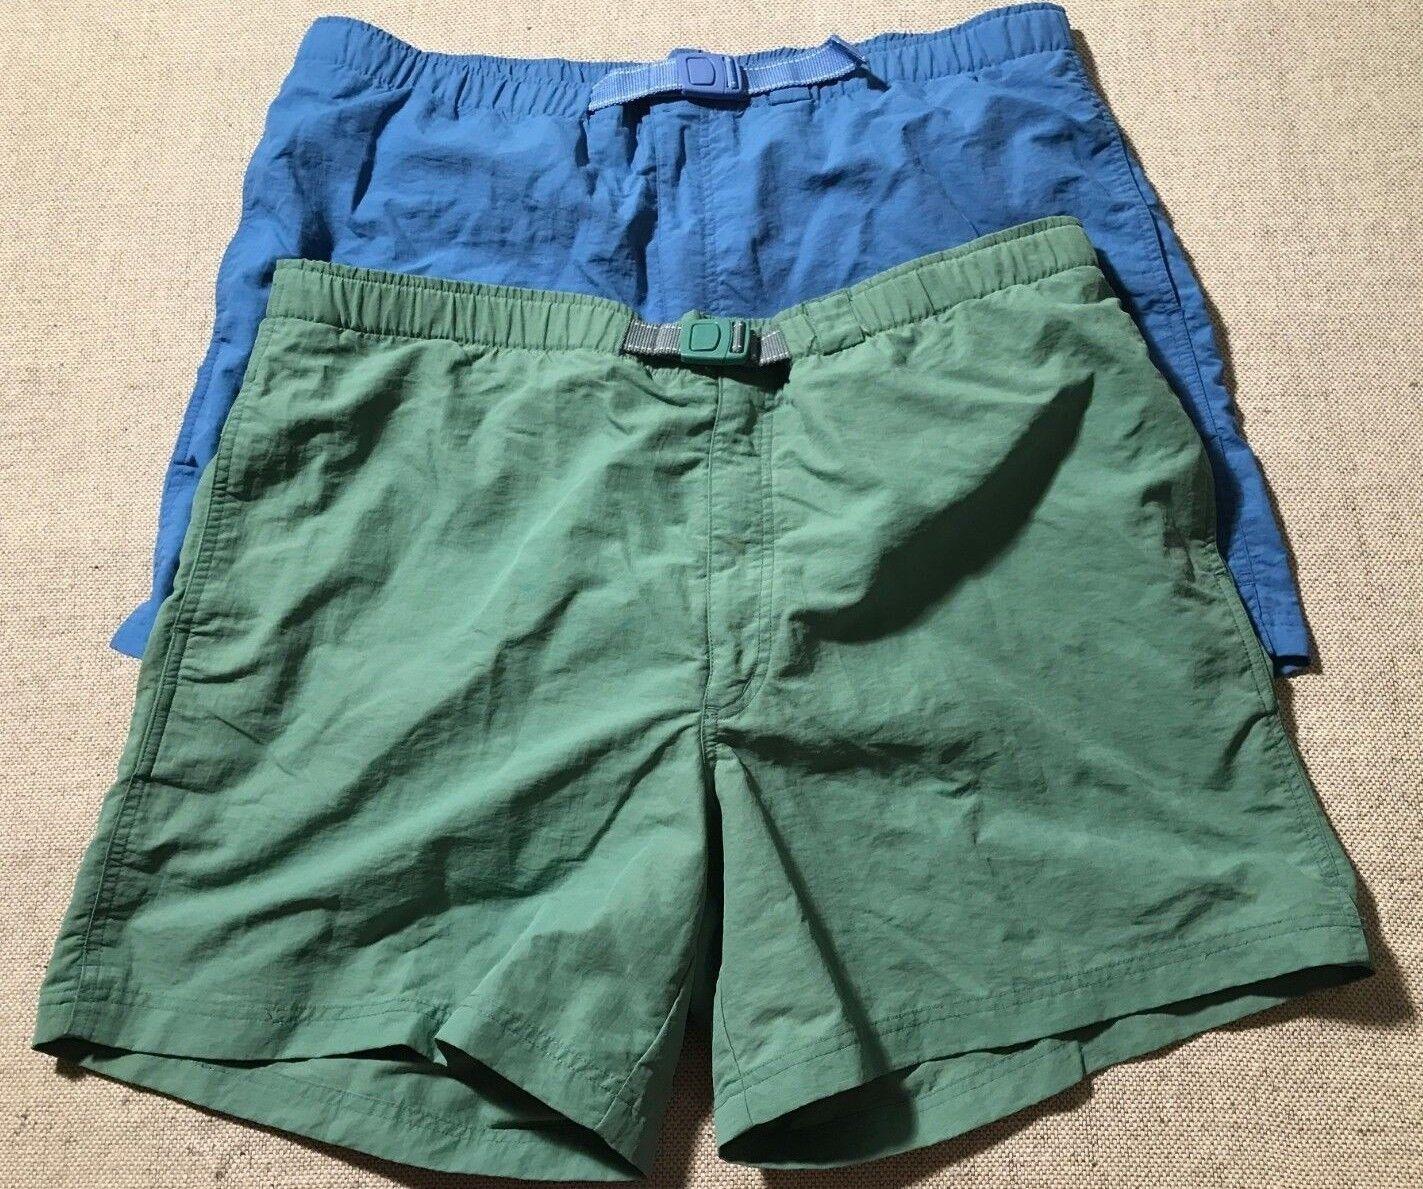 Lot of 2 Lands' End Men's Nylon Belted Swim Trunks Mesh Lining Shorts Sz XL  C9